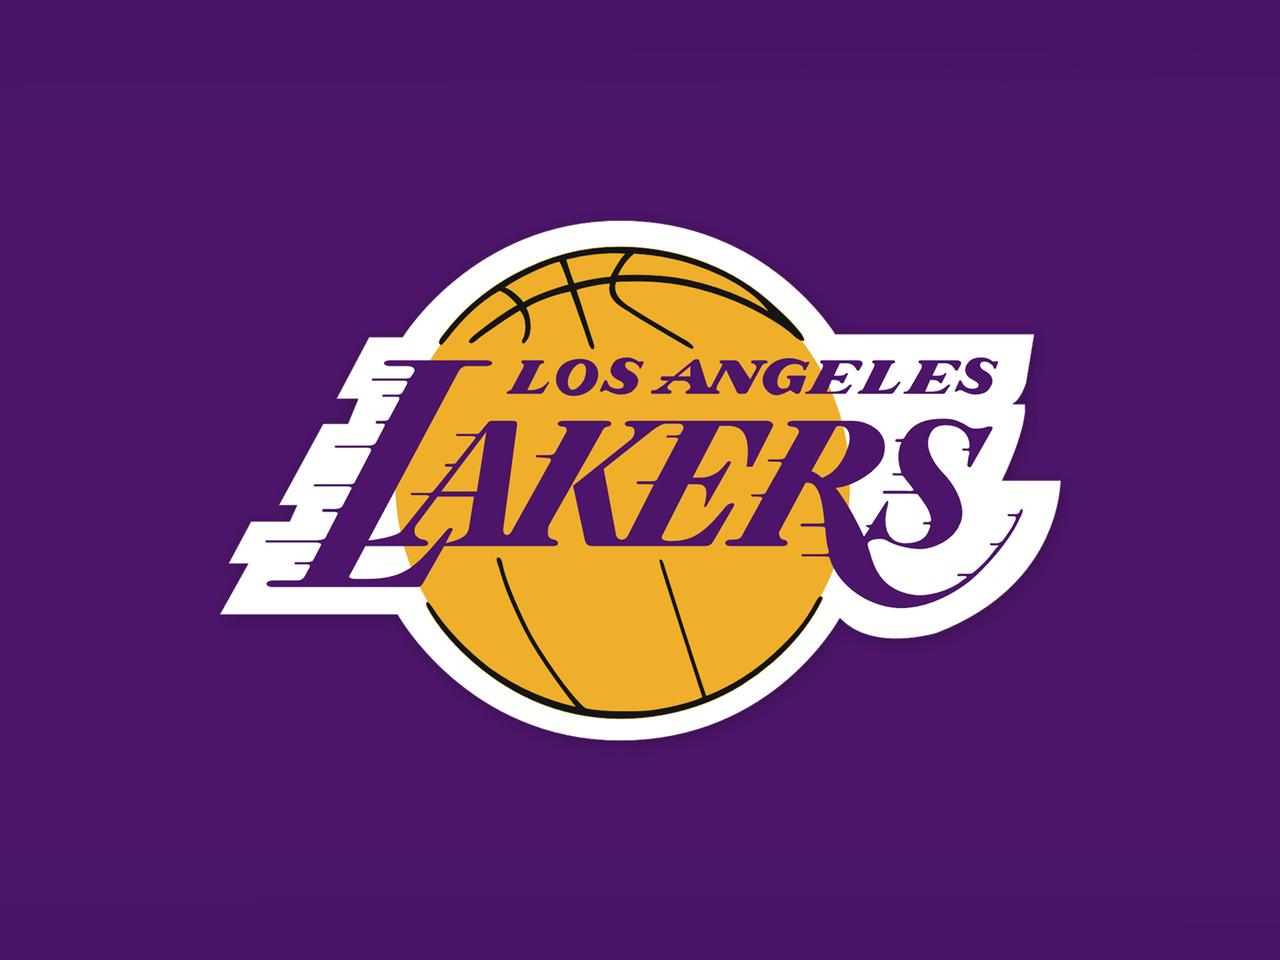 5f379cf4 Лос Анджелес Лейкерс / LAKERS Los Angeles - в интернет-магазине  баскетбольной формы NBA.